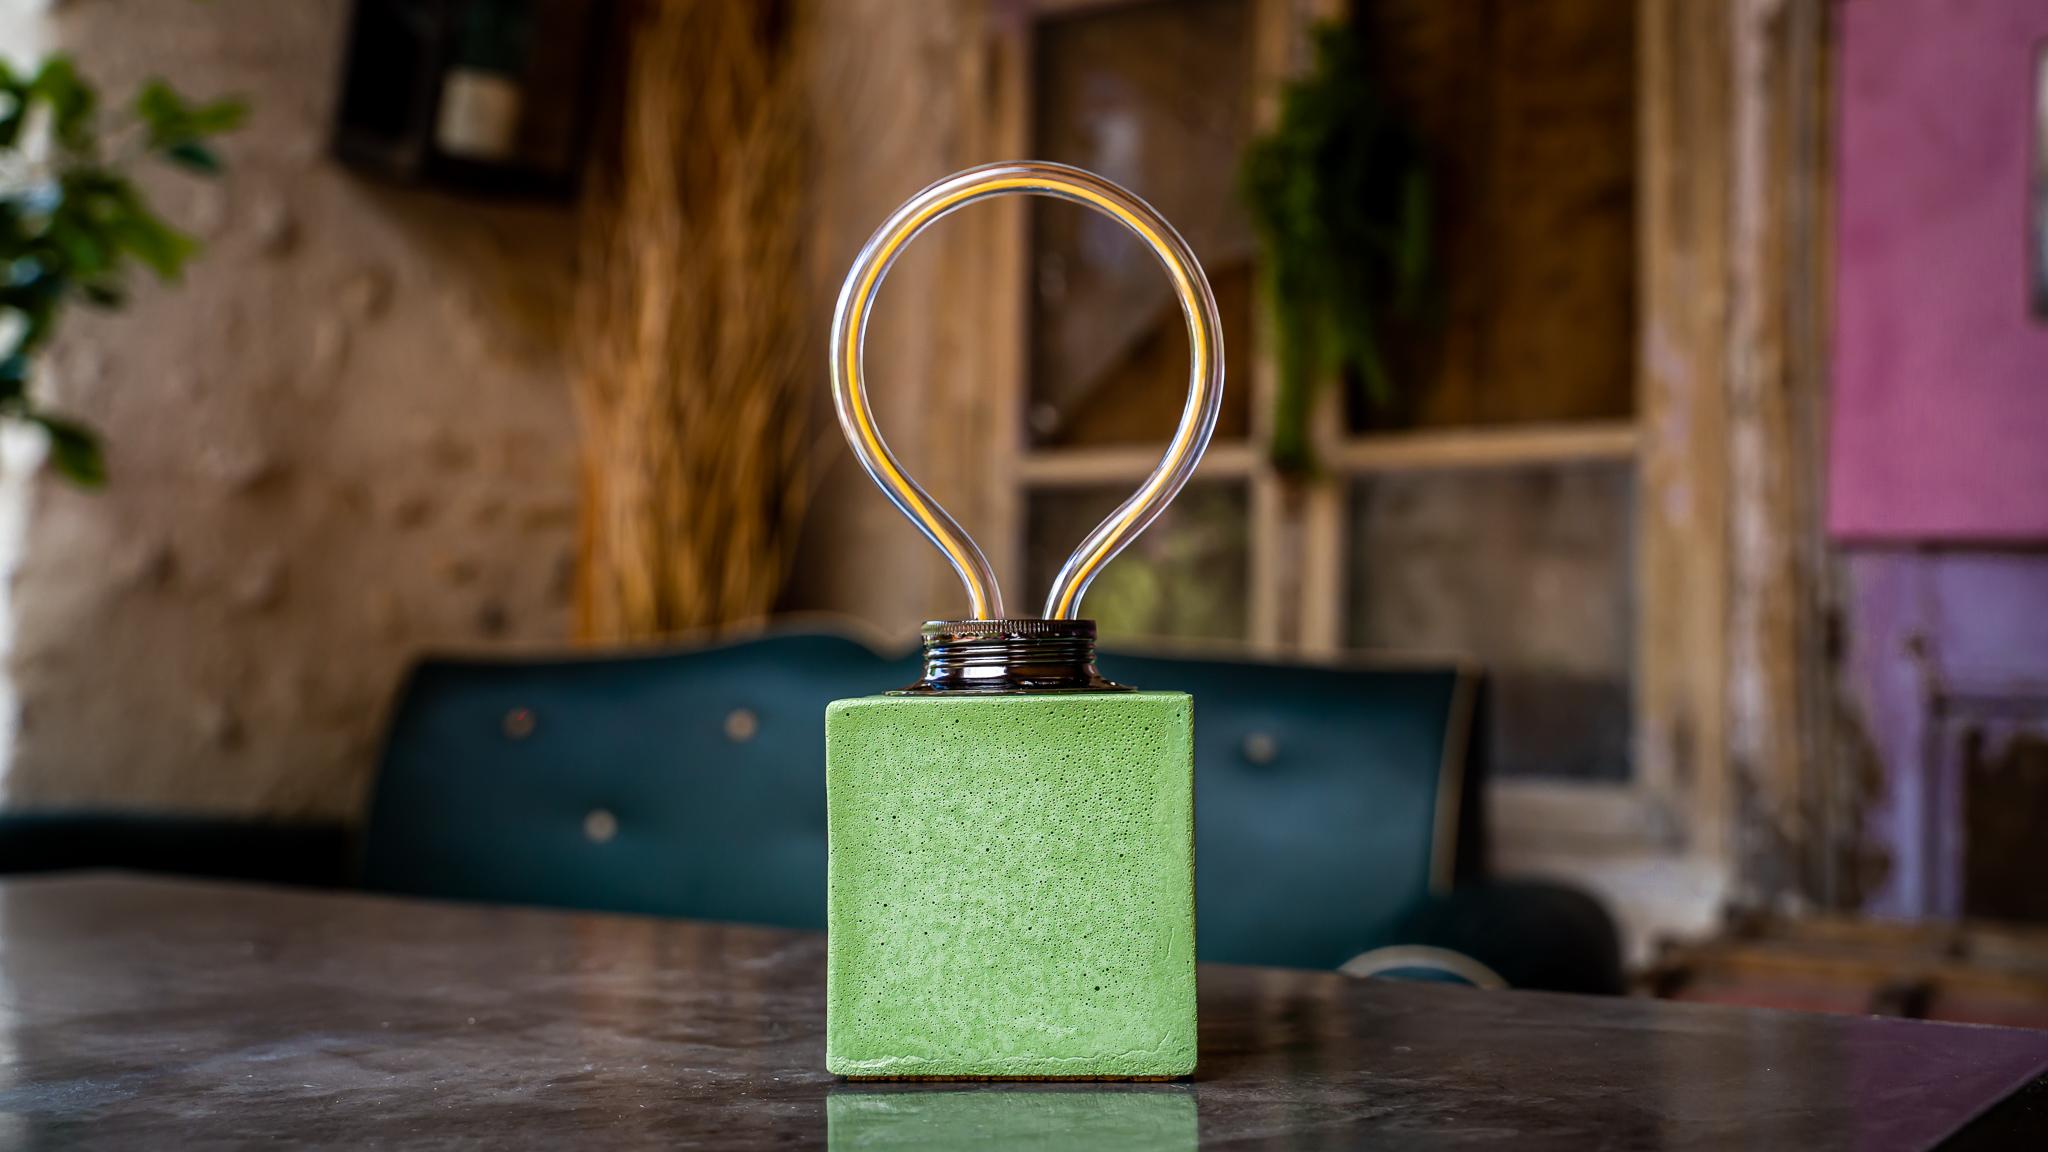 Lampe cube néon en béton vert fabrication artisanale